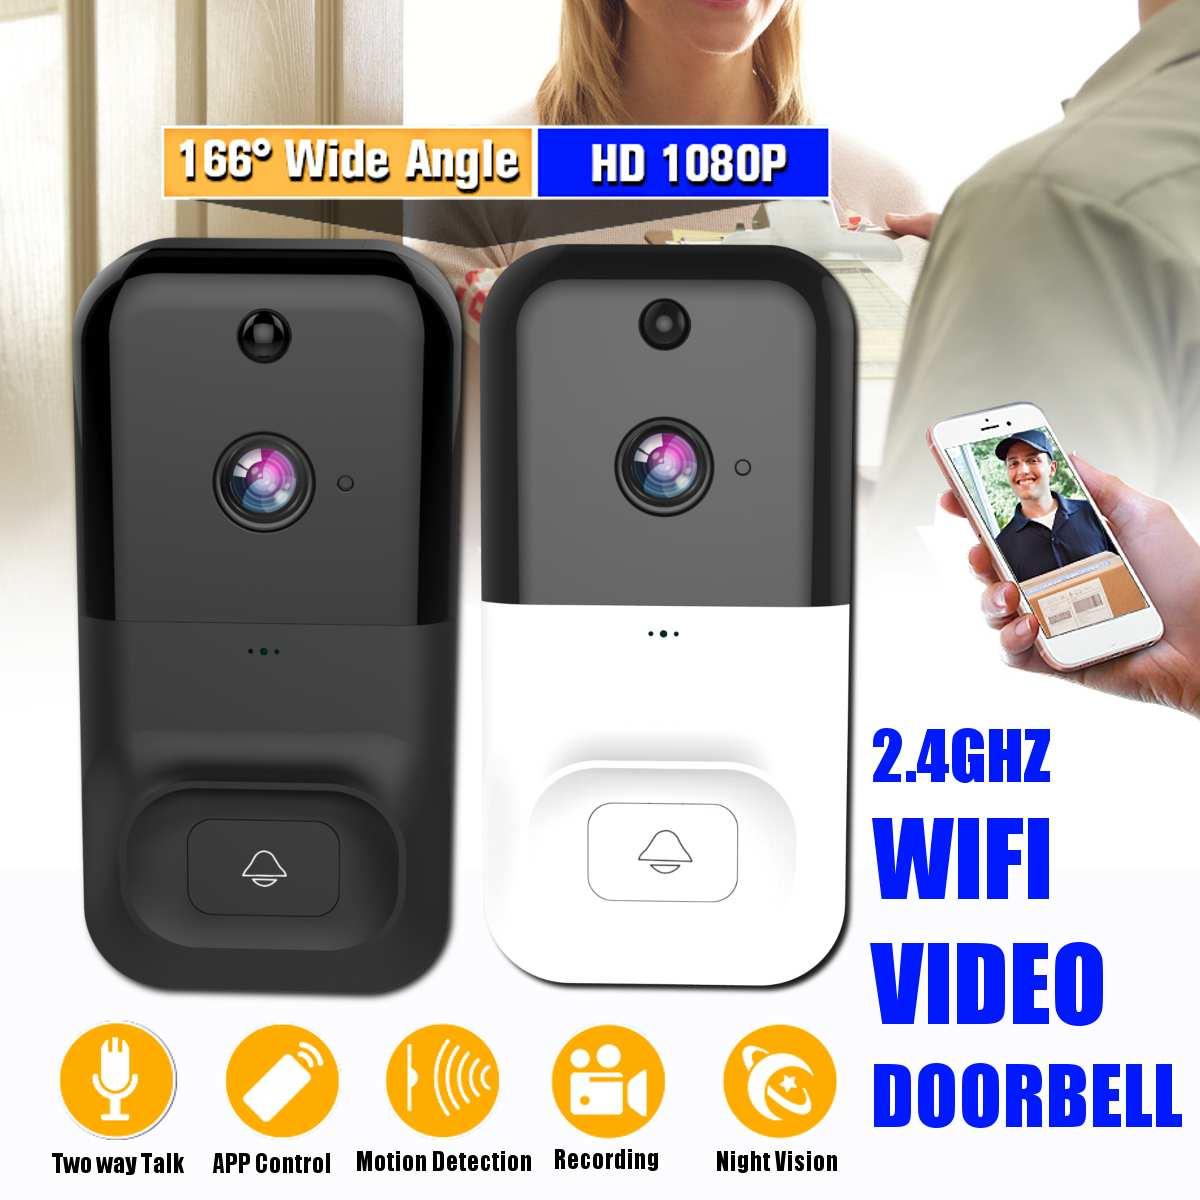 Wireless Wifi Doorbell Infrared Smart Video Chime Intercom HD 1080P Home IP Door Bell Camera Security Alarm IR Night Vision